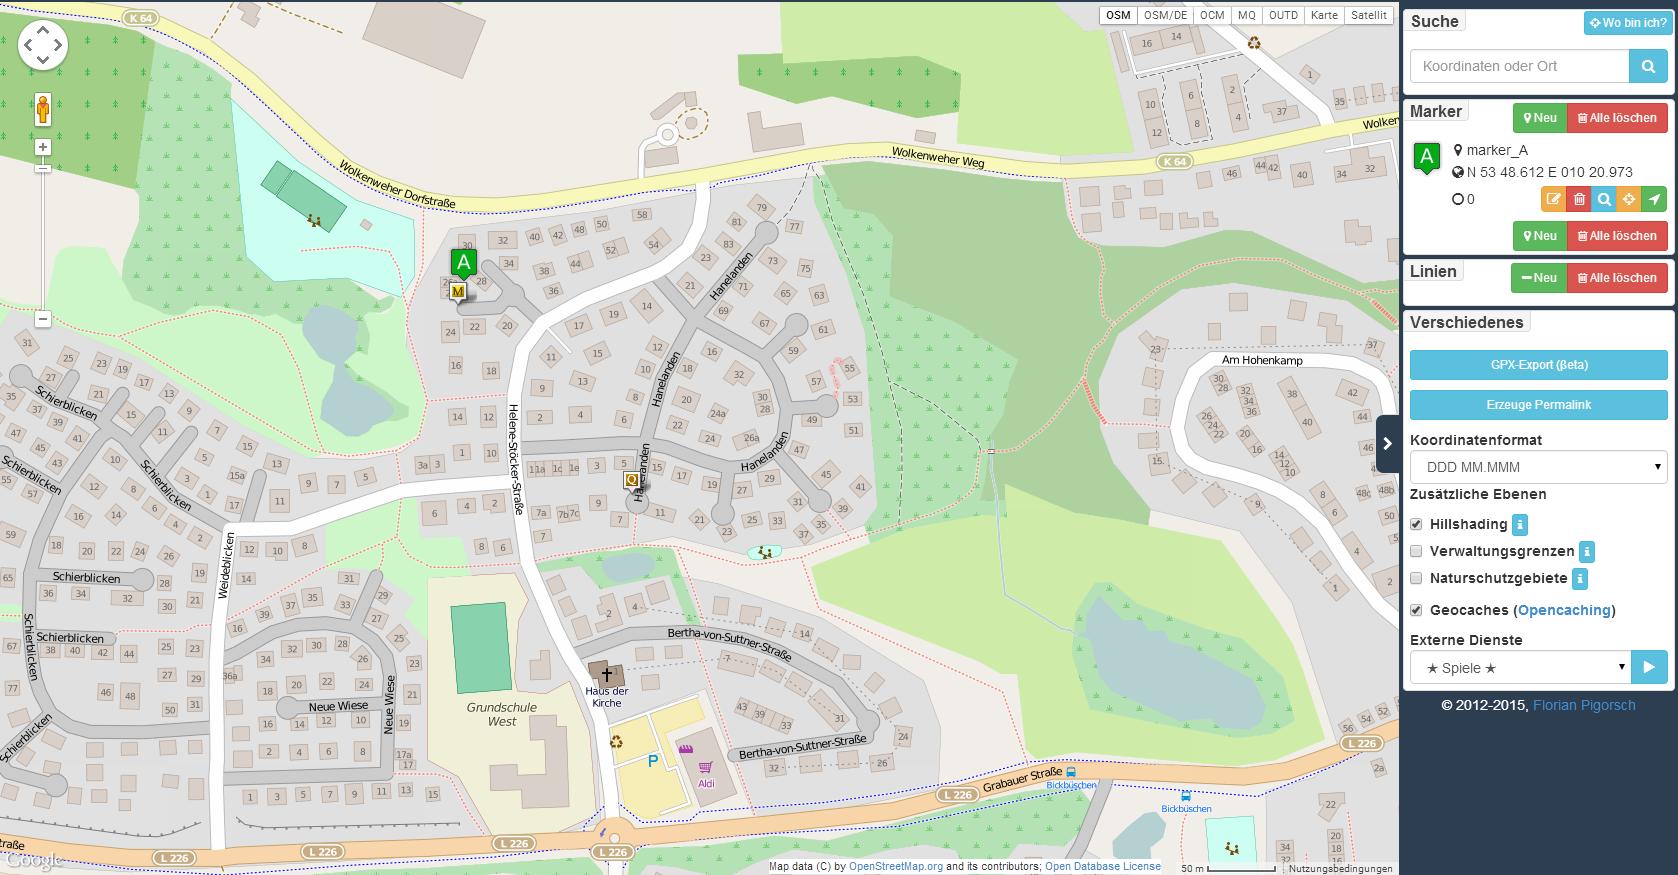 Koordinaten direkt in Karte anzeigen lassen: perfektes Geocaching-Tool!